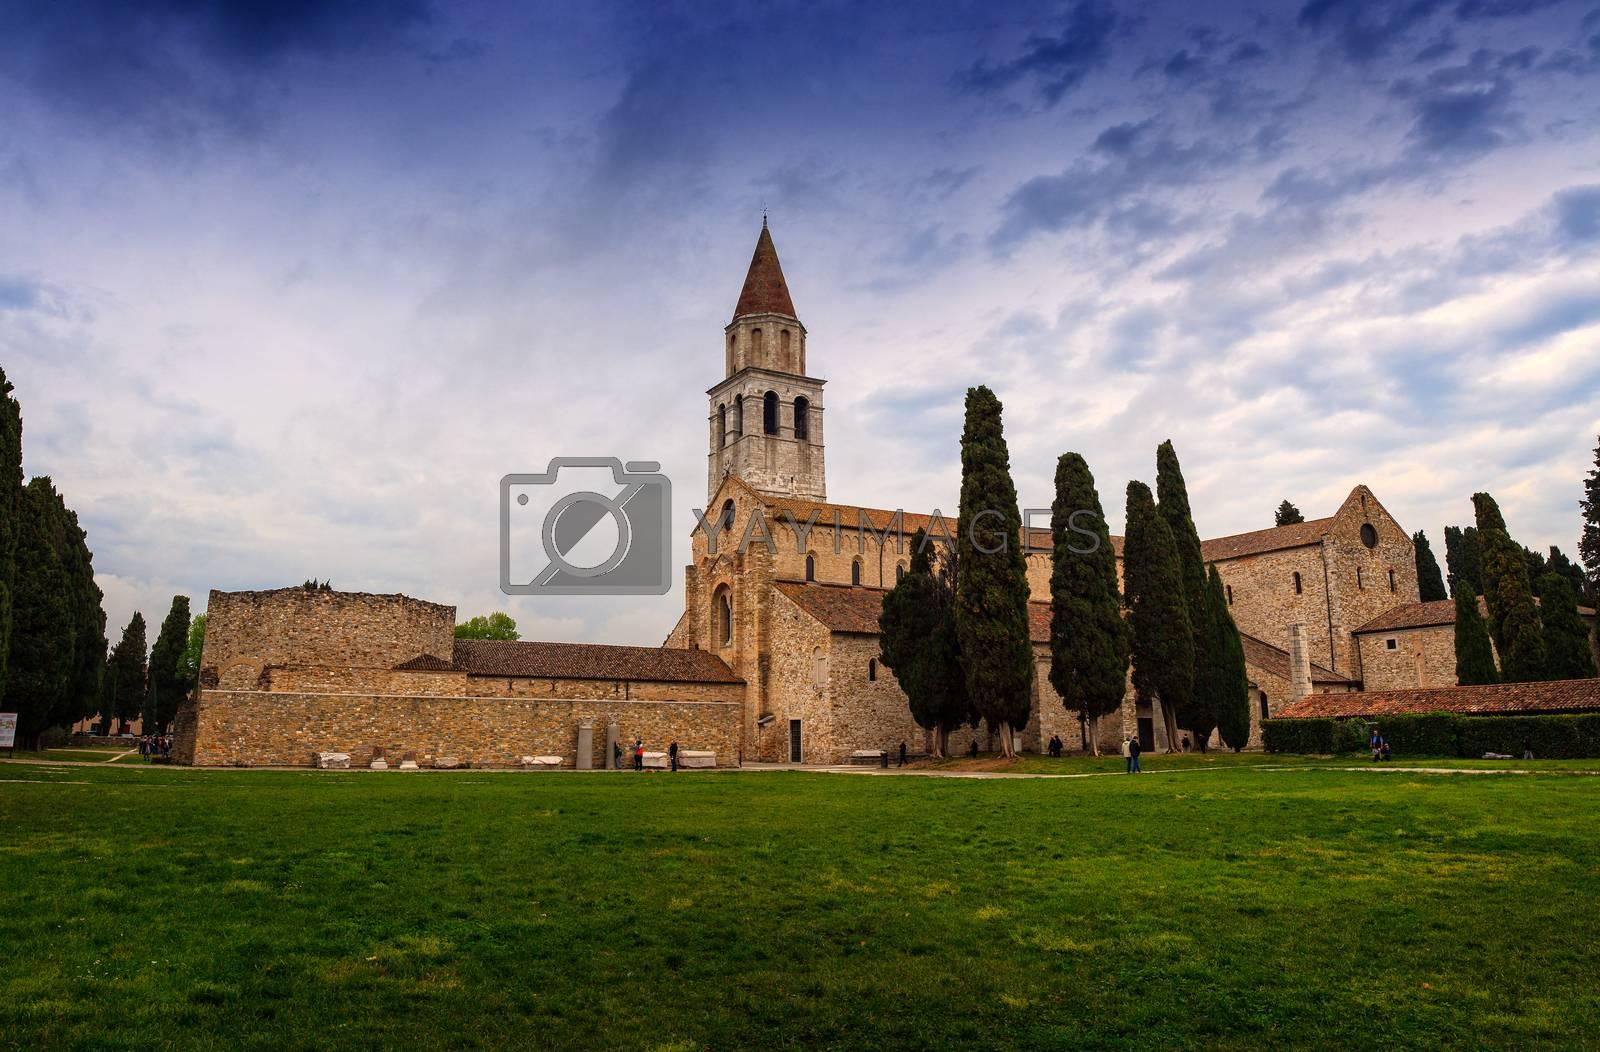 View of Basilica di Santa Maria Assunta and bell tower of Aquileia, Italy. Aquileia is UNESCO World Heritage Site